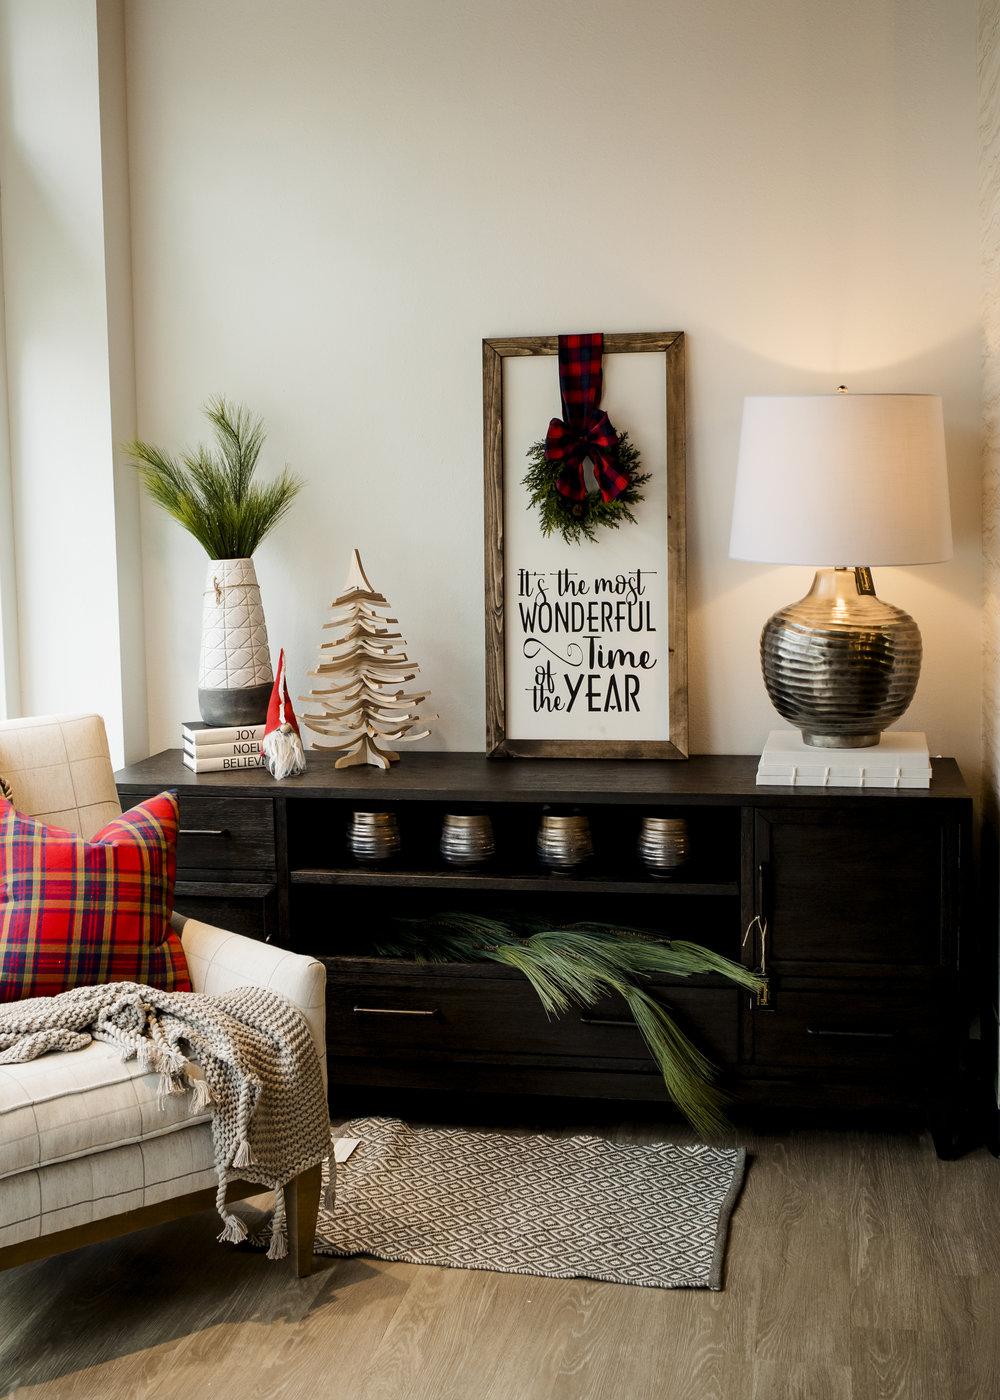 Swivel Tree $34, Santa Gnome $13, Harrier Gray Vase $75, Pine Spray $7.50, Joy/Noel/Believe Books $37/ec, Long Needles Pine Hanging $44, Accent Rug $56, Gray Organic Cotton Throw $145, Plaid Pillow $41.50, Make & Take Wonder Sign $65, Pots $14.50/ec